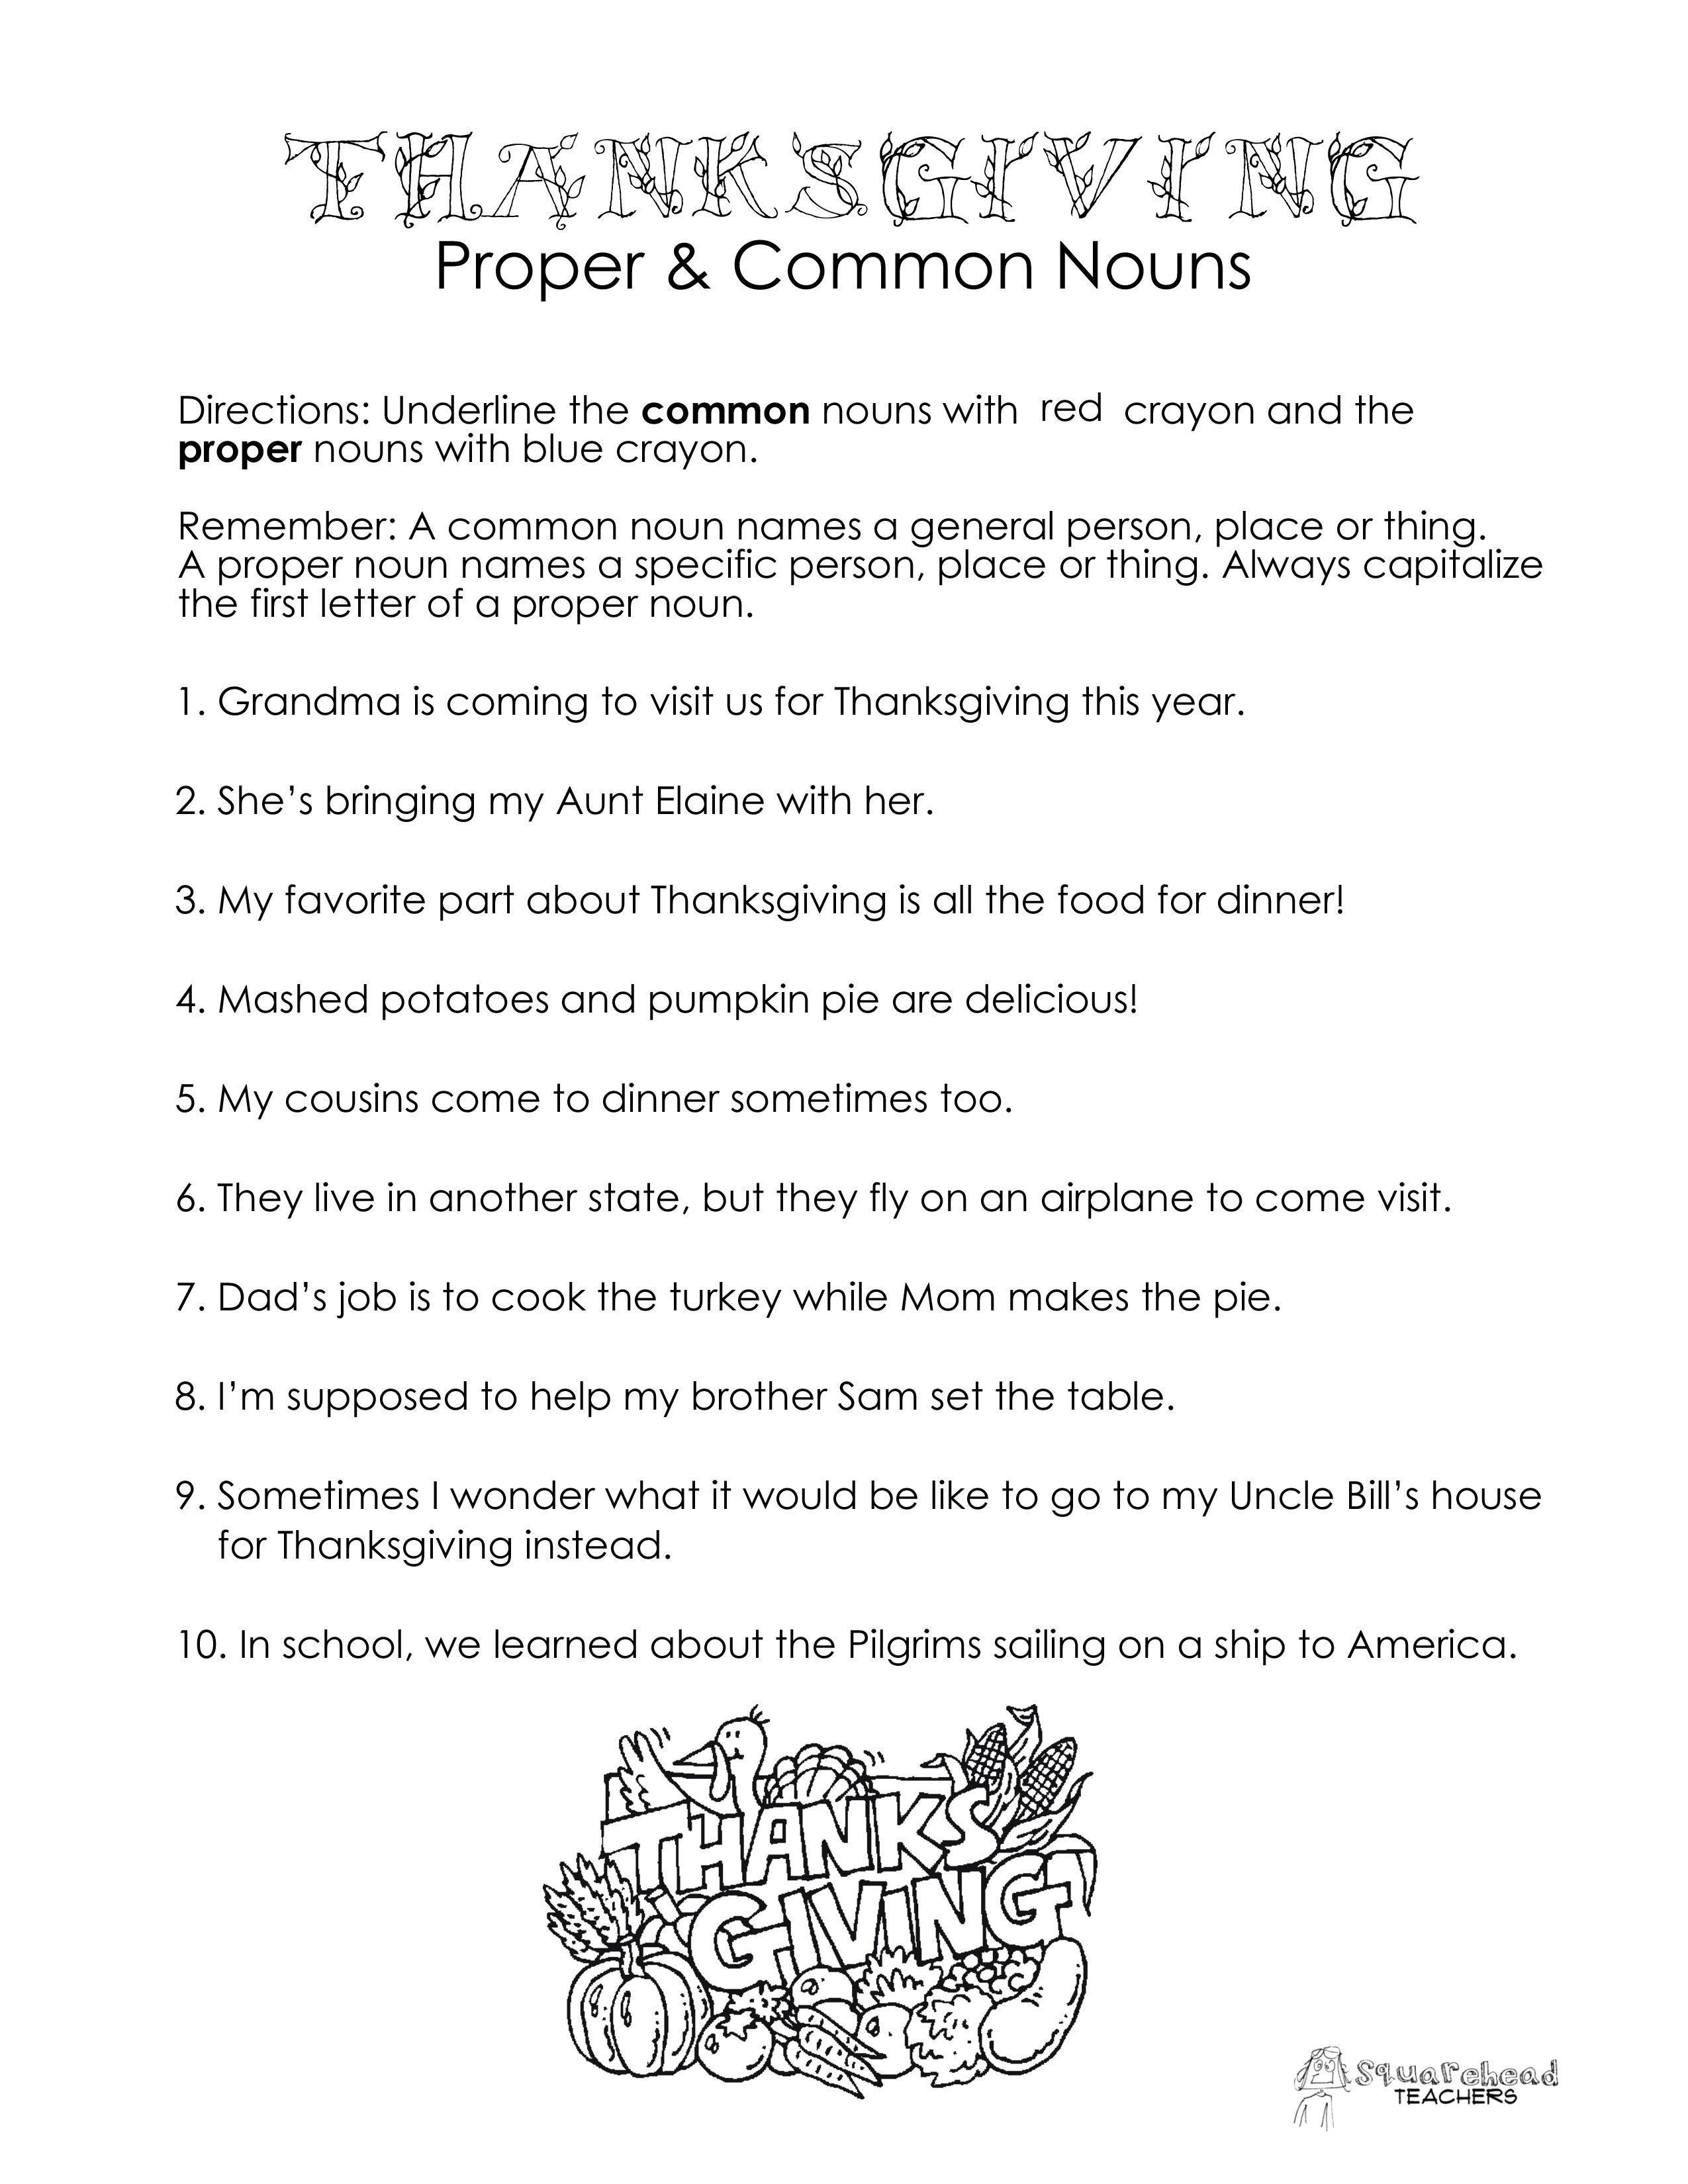 Thanksgiving Proper Amp Common Nouns